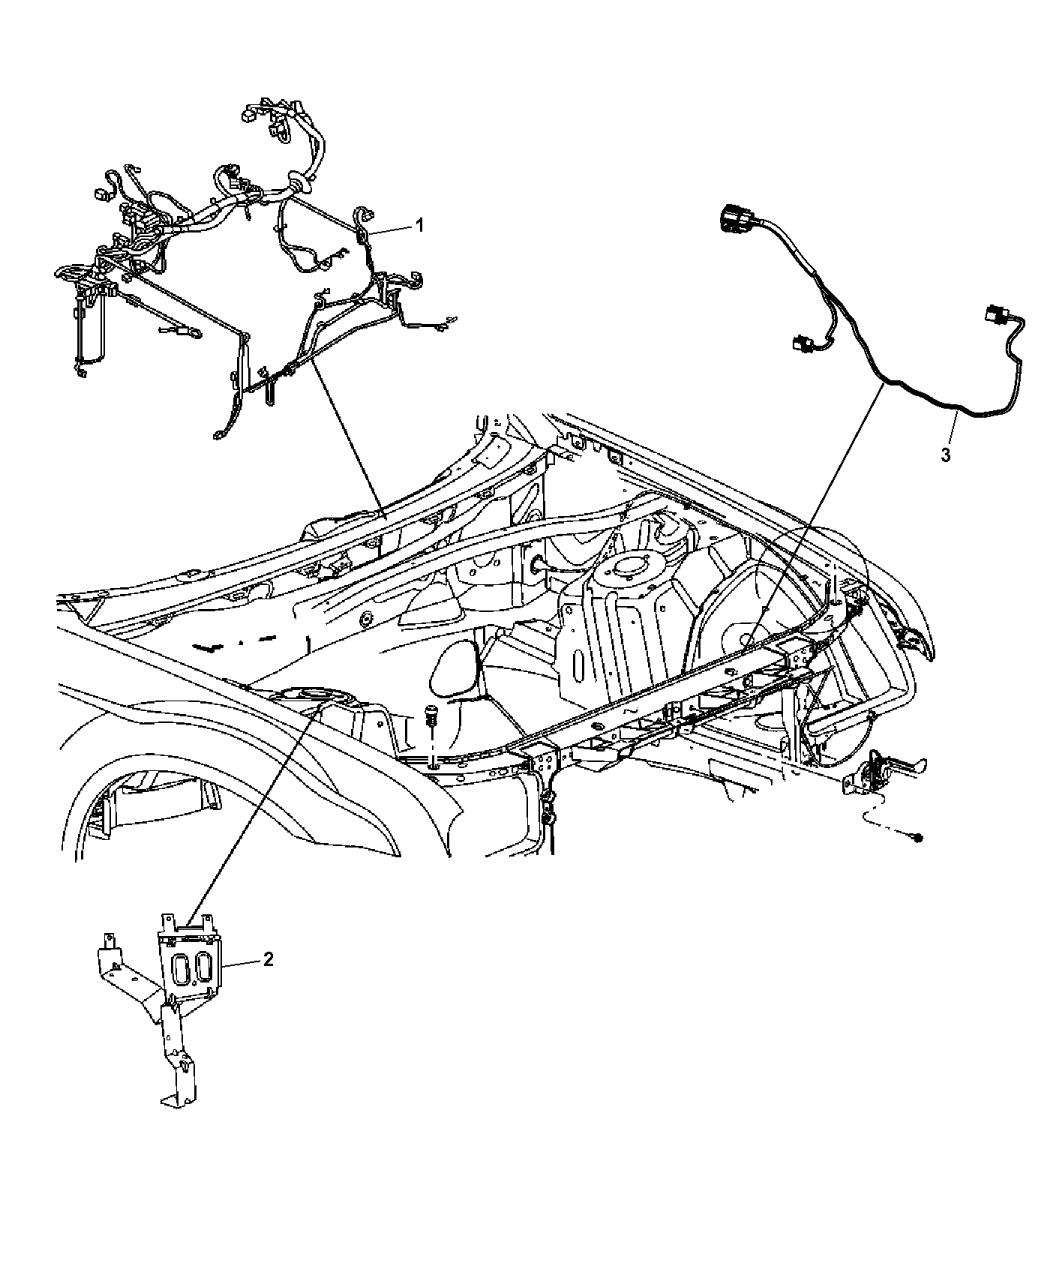 1967 dodge charger wiring diagram 2015 dodge charger wiring diagram 68213737ac - genuine mopar wiring-headlamp to dash